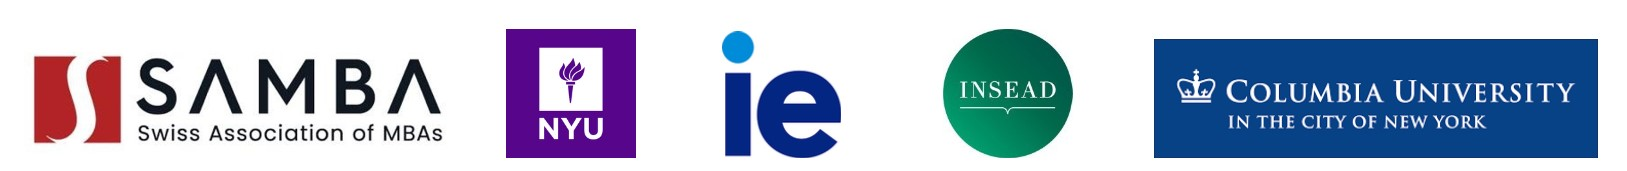 ivyleague_logos.jpg